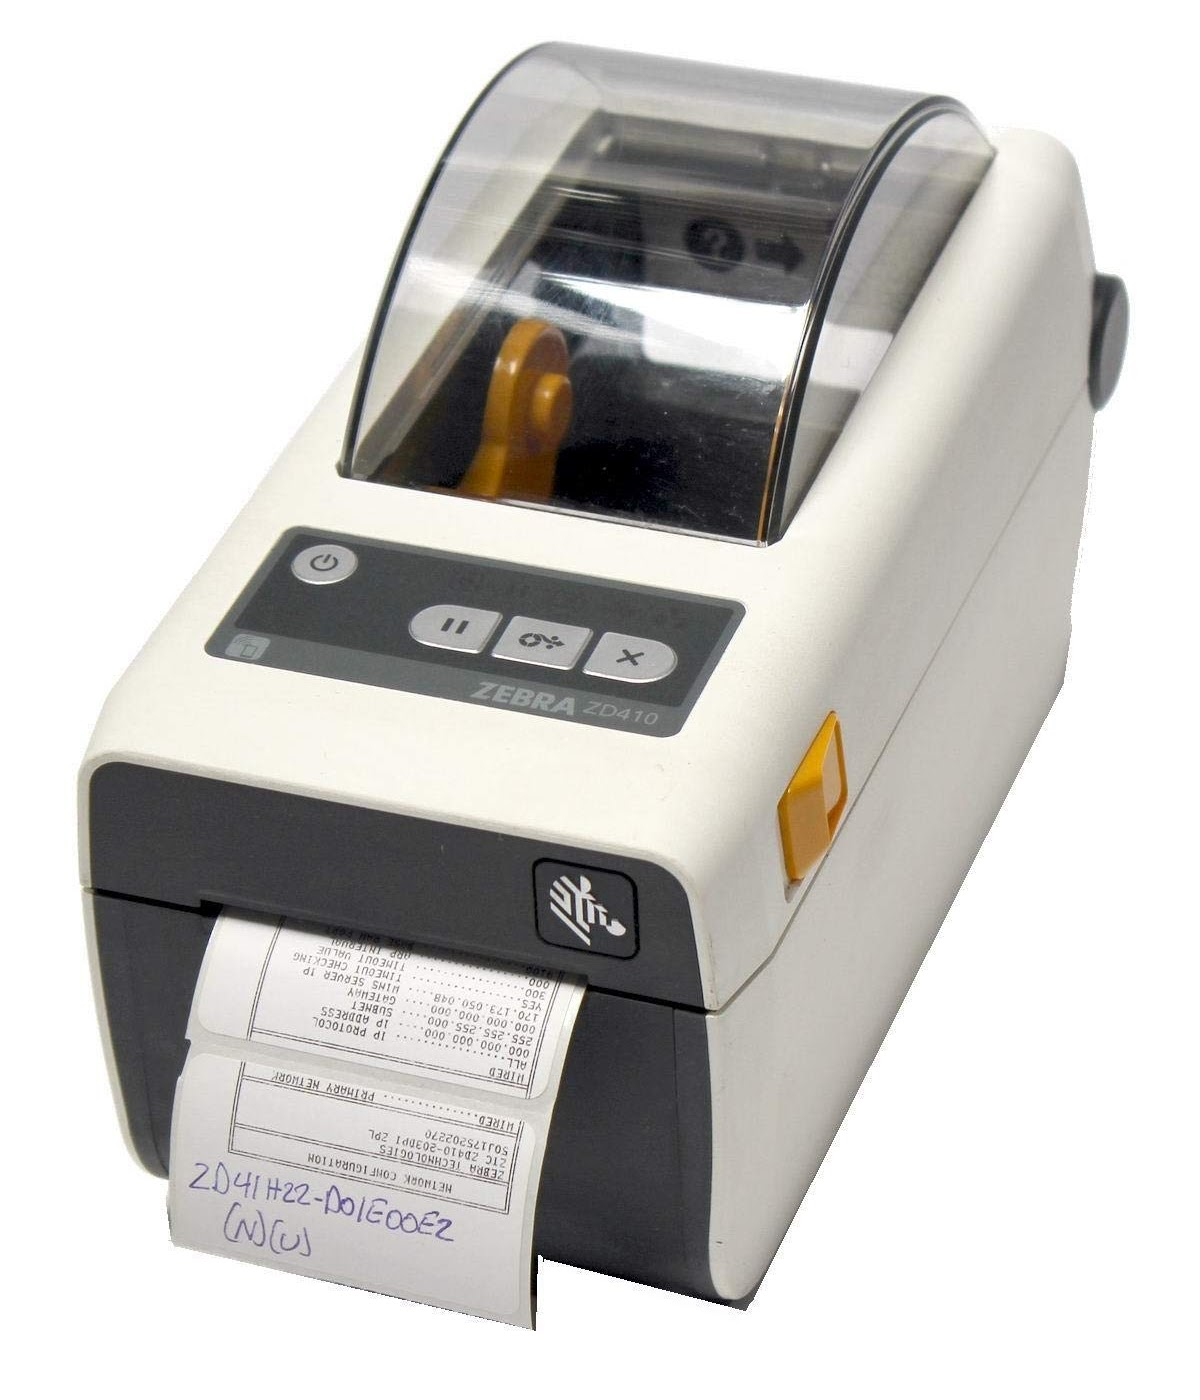 4 in//s Print Speed 100//240V AC 2.20 Print Width 203 dpi Print Resolution Zebra LP 2824 Plus Monochrome Direct Thermal Label Desktop Printer